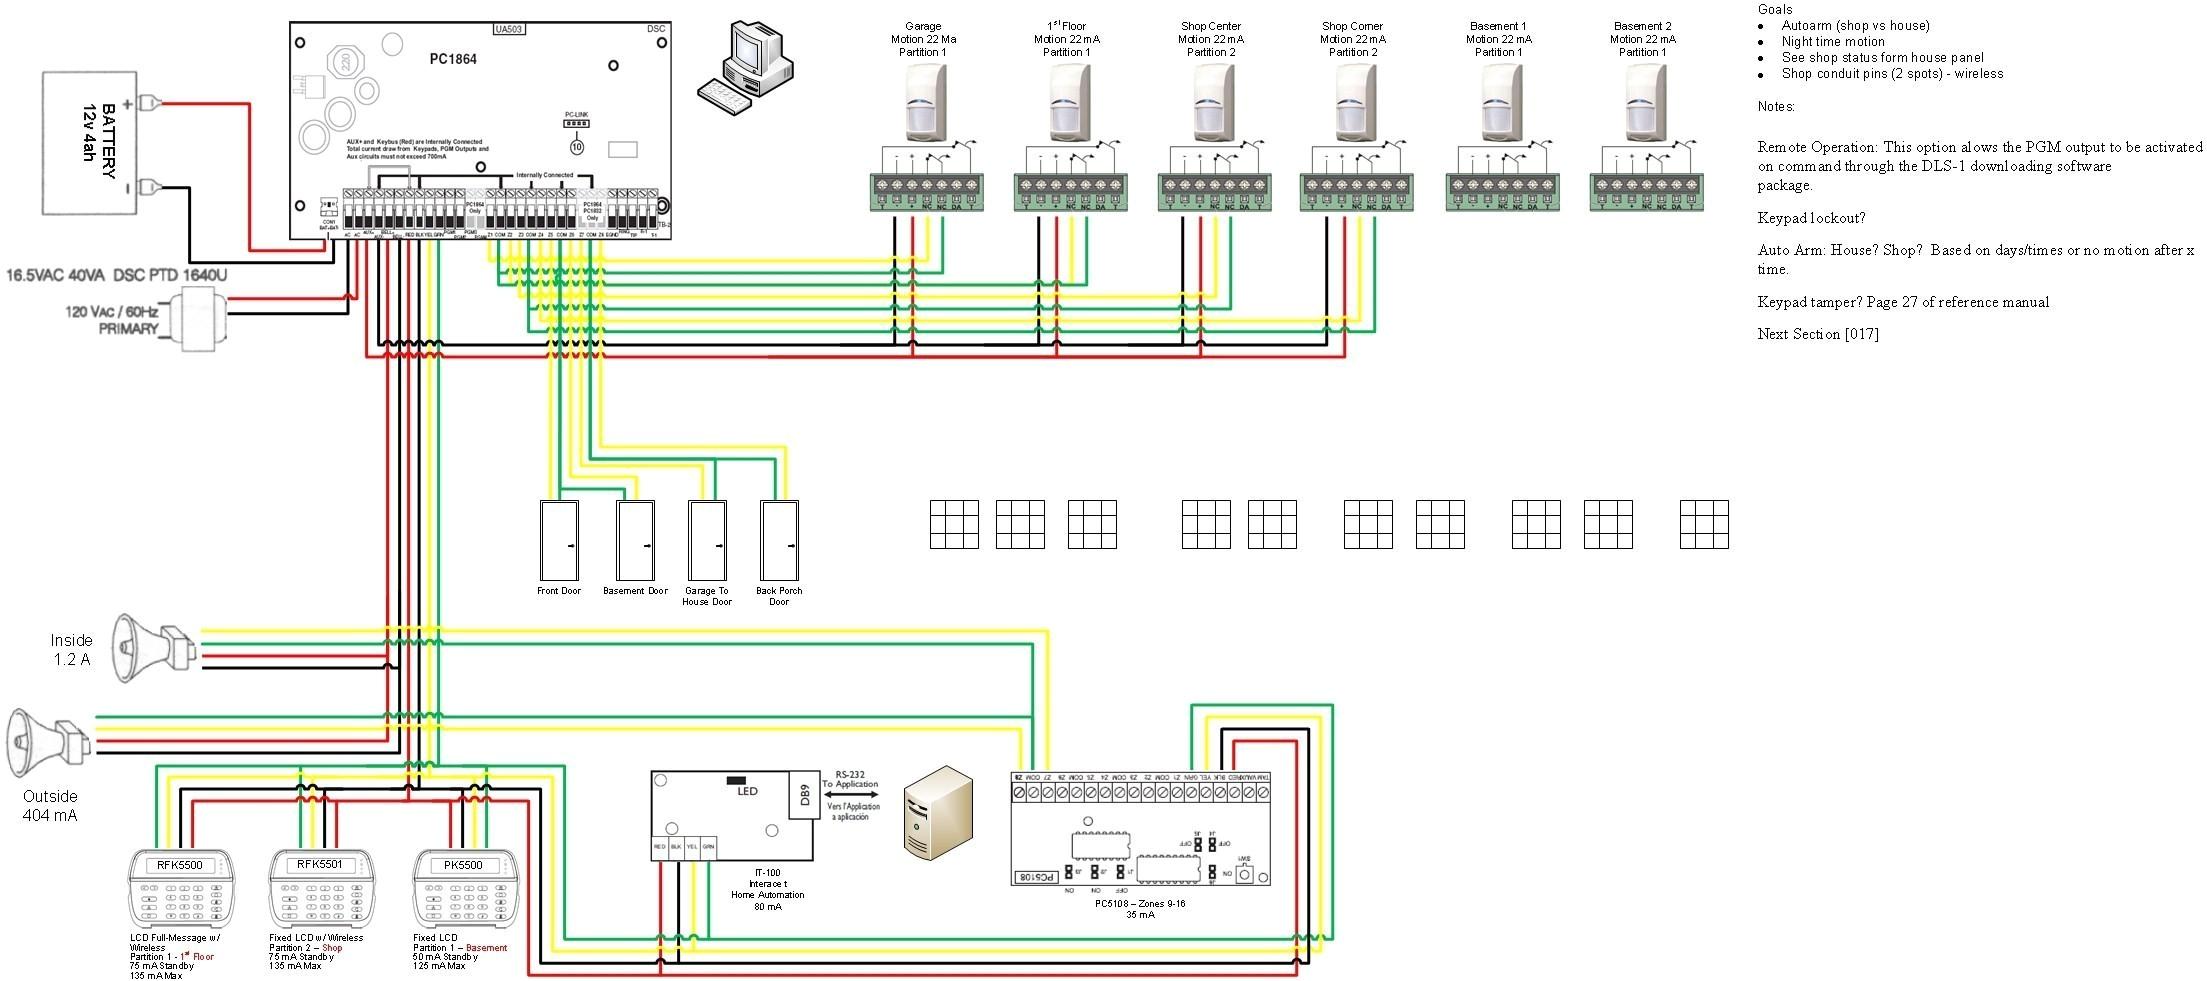 wire diagrams at bulldog security data schematic diagram wiring bulldog diagram security 1640b tr02